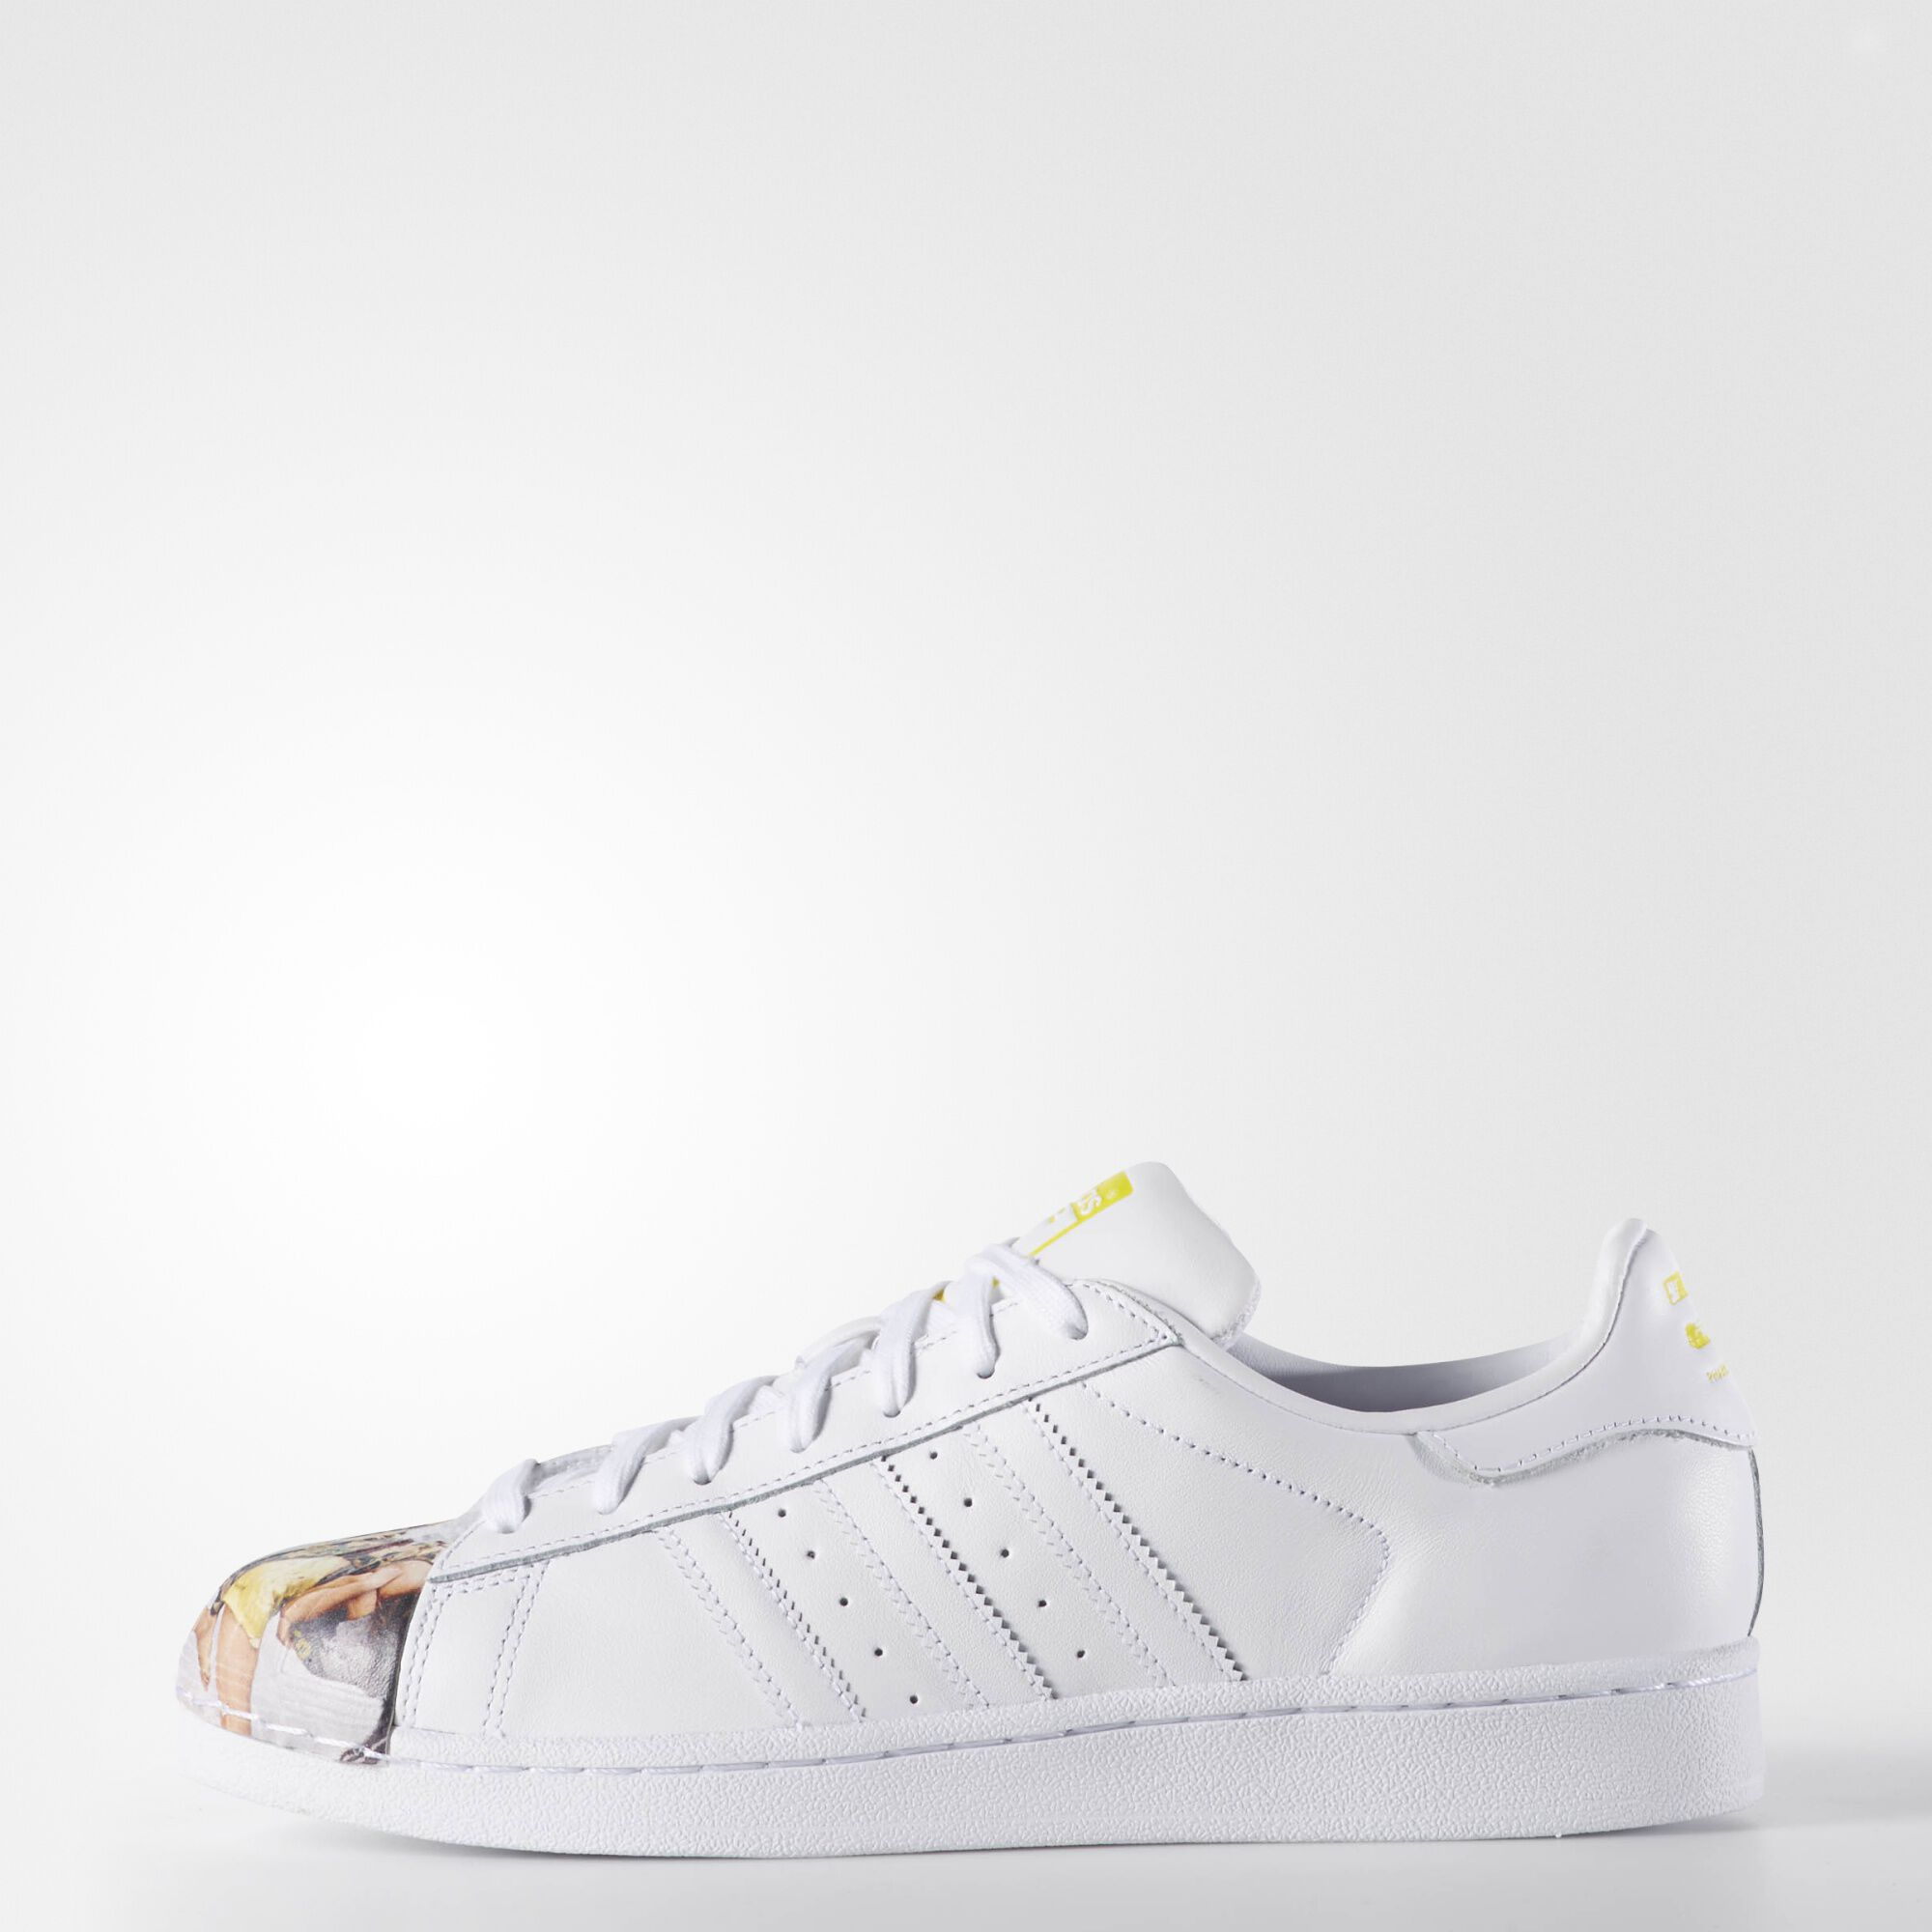 adidas , Zapatillas Originals Superstar Pharrell Supershell Ftwr White / Ftwr White / Yellow S83363